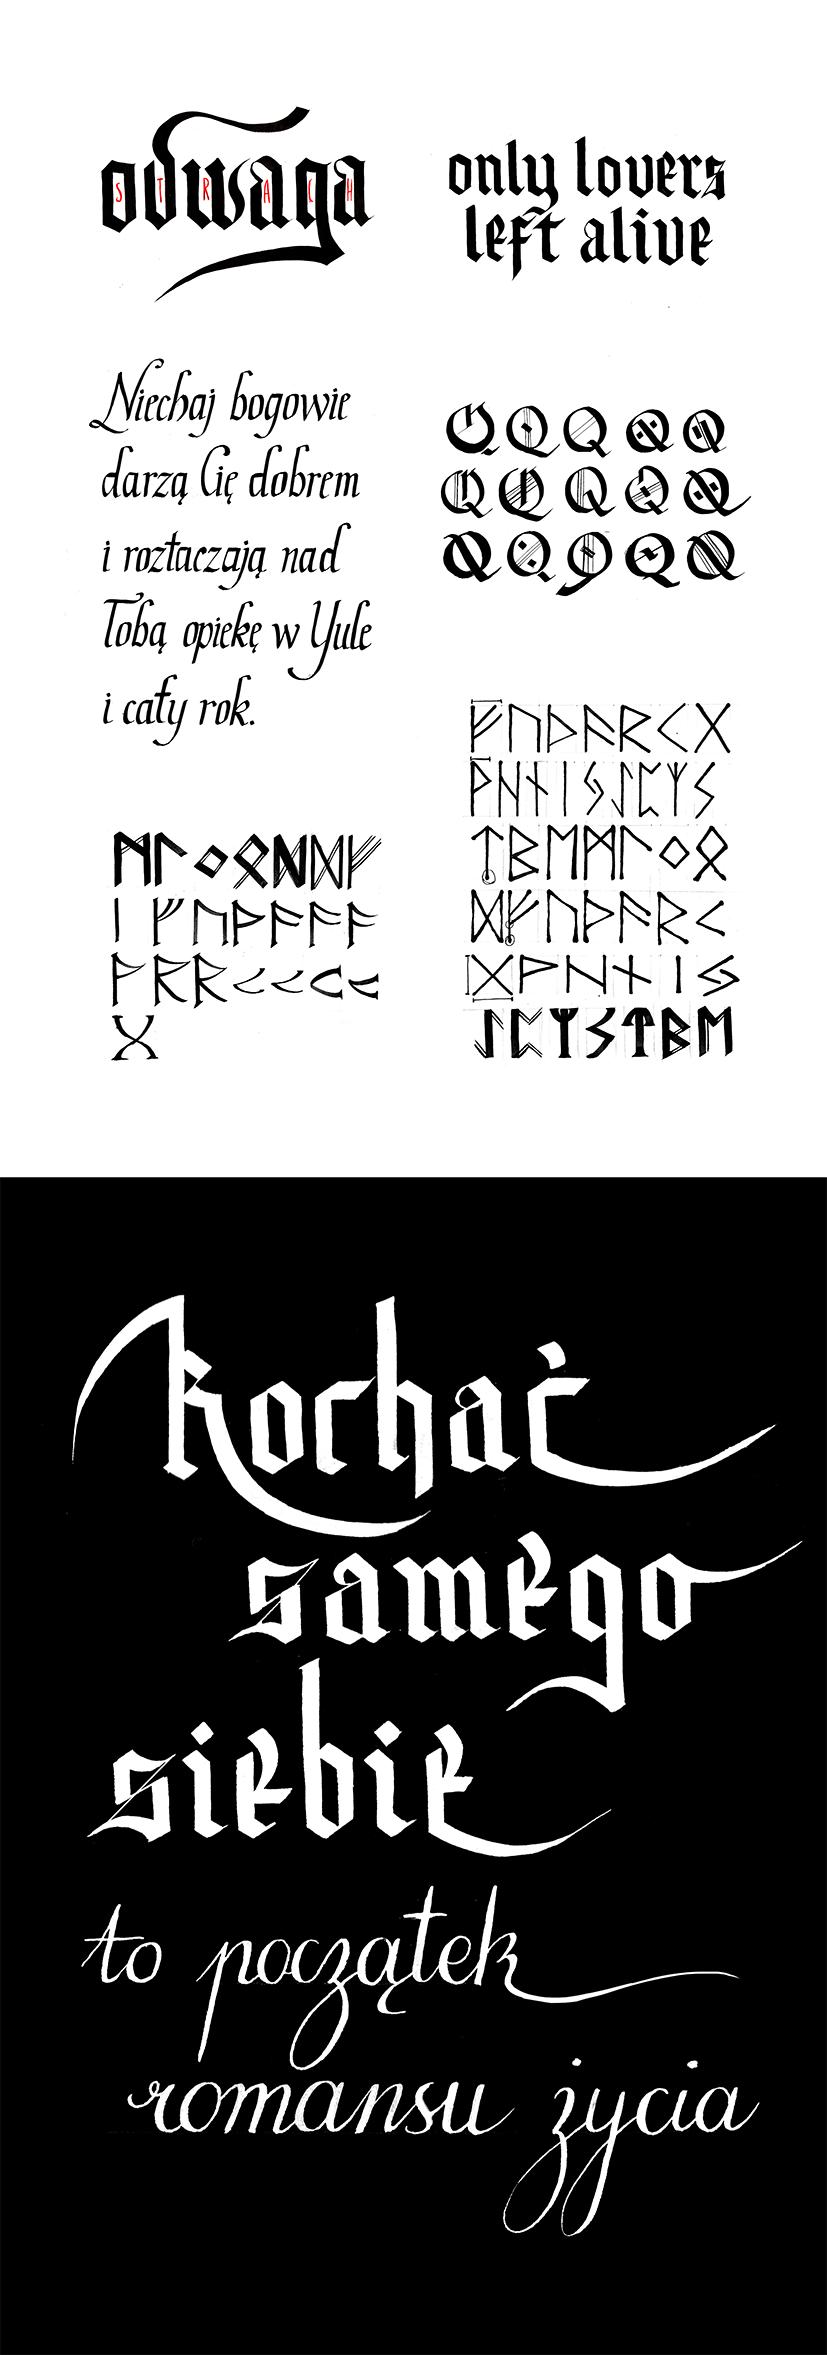 Calligraphy School Works By Madblackie On Deviantart